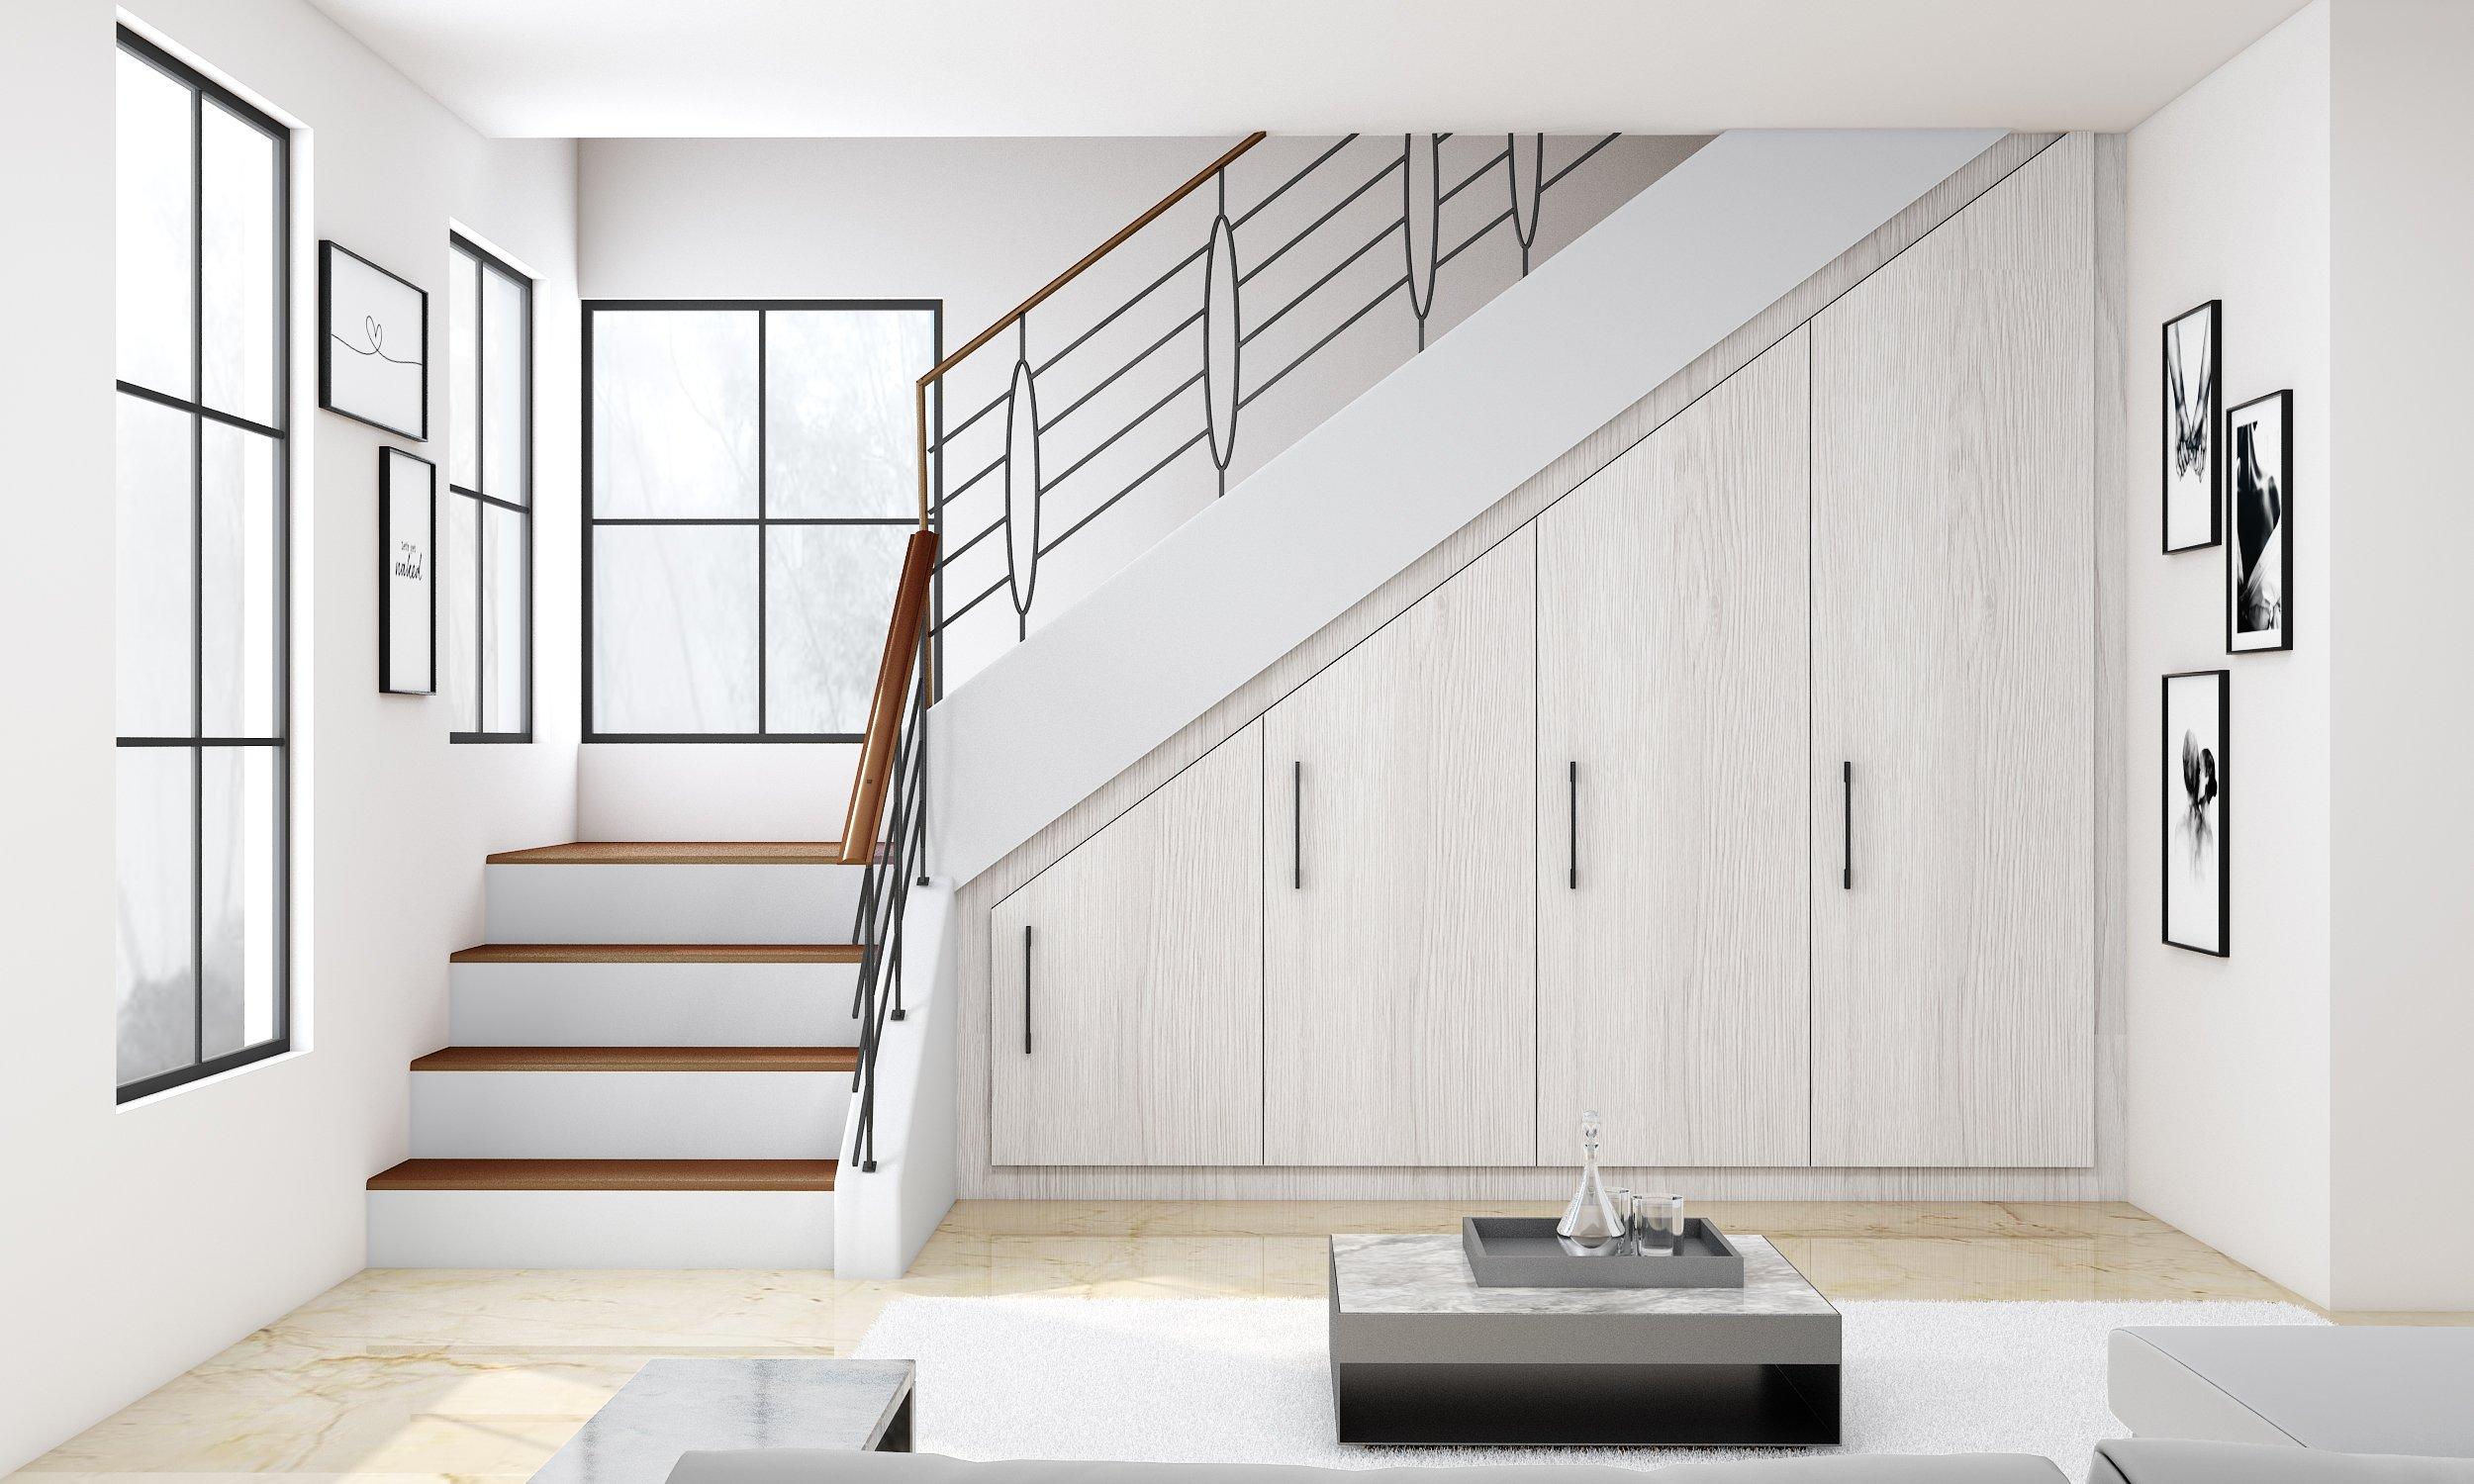 Attic Loft Fitted Staircase Wardrobe Storage in White Oak Woodgrain Finish